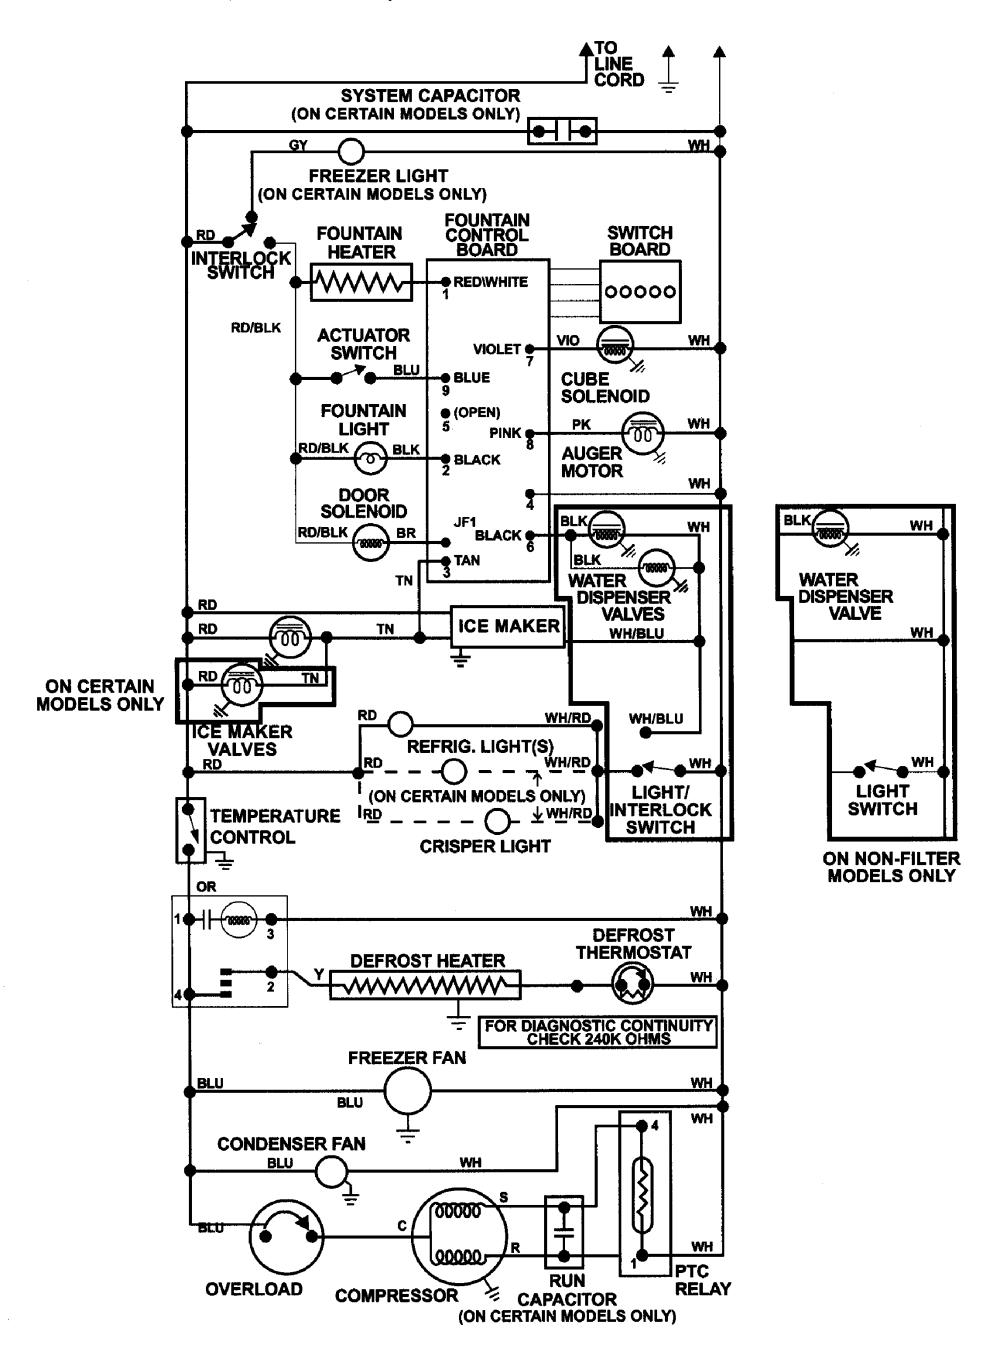 medium resolution of maytag refrigerator wiring diagram 28 images wiring compressor start relay wiring diagram embraco compressor wiring diagram